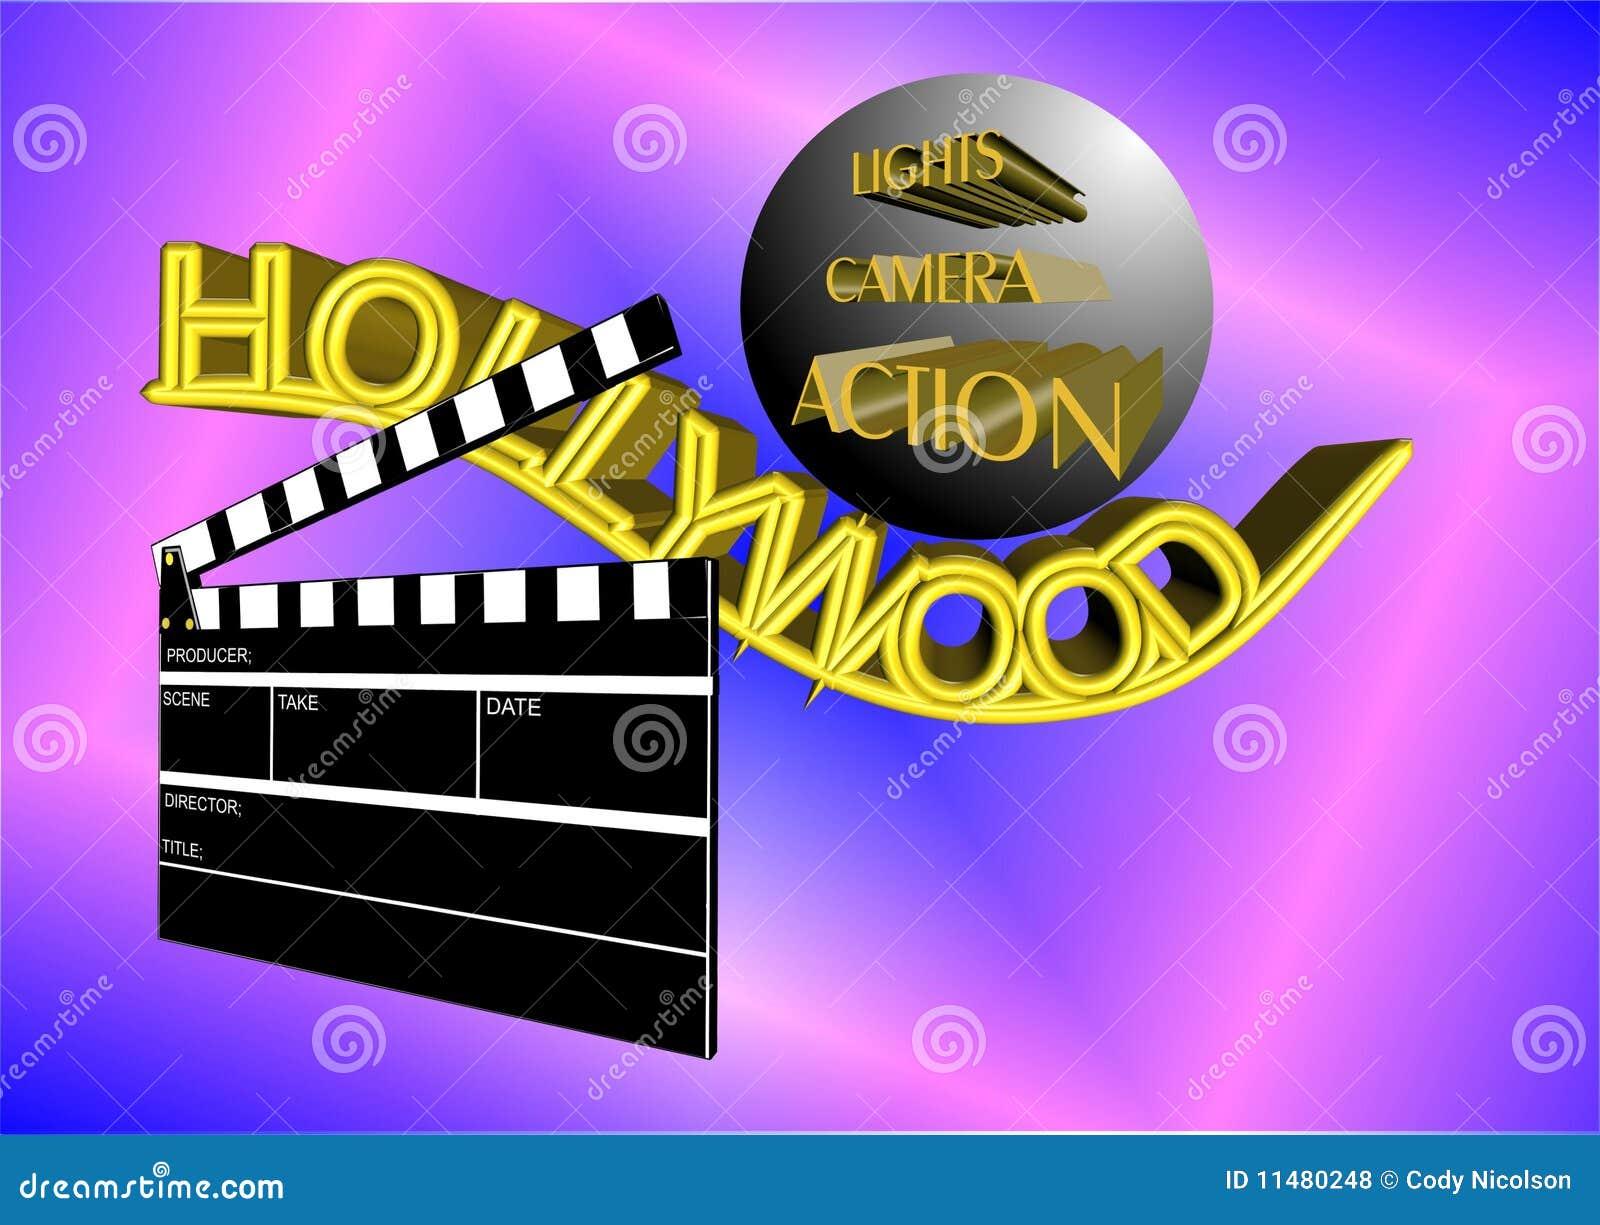 Hollywood affisch